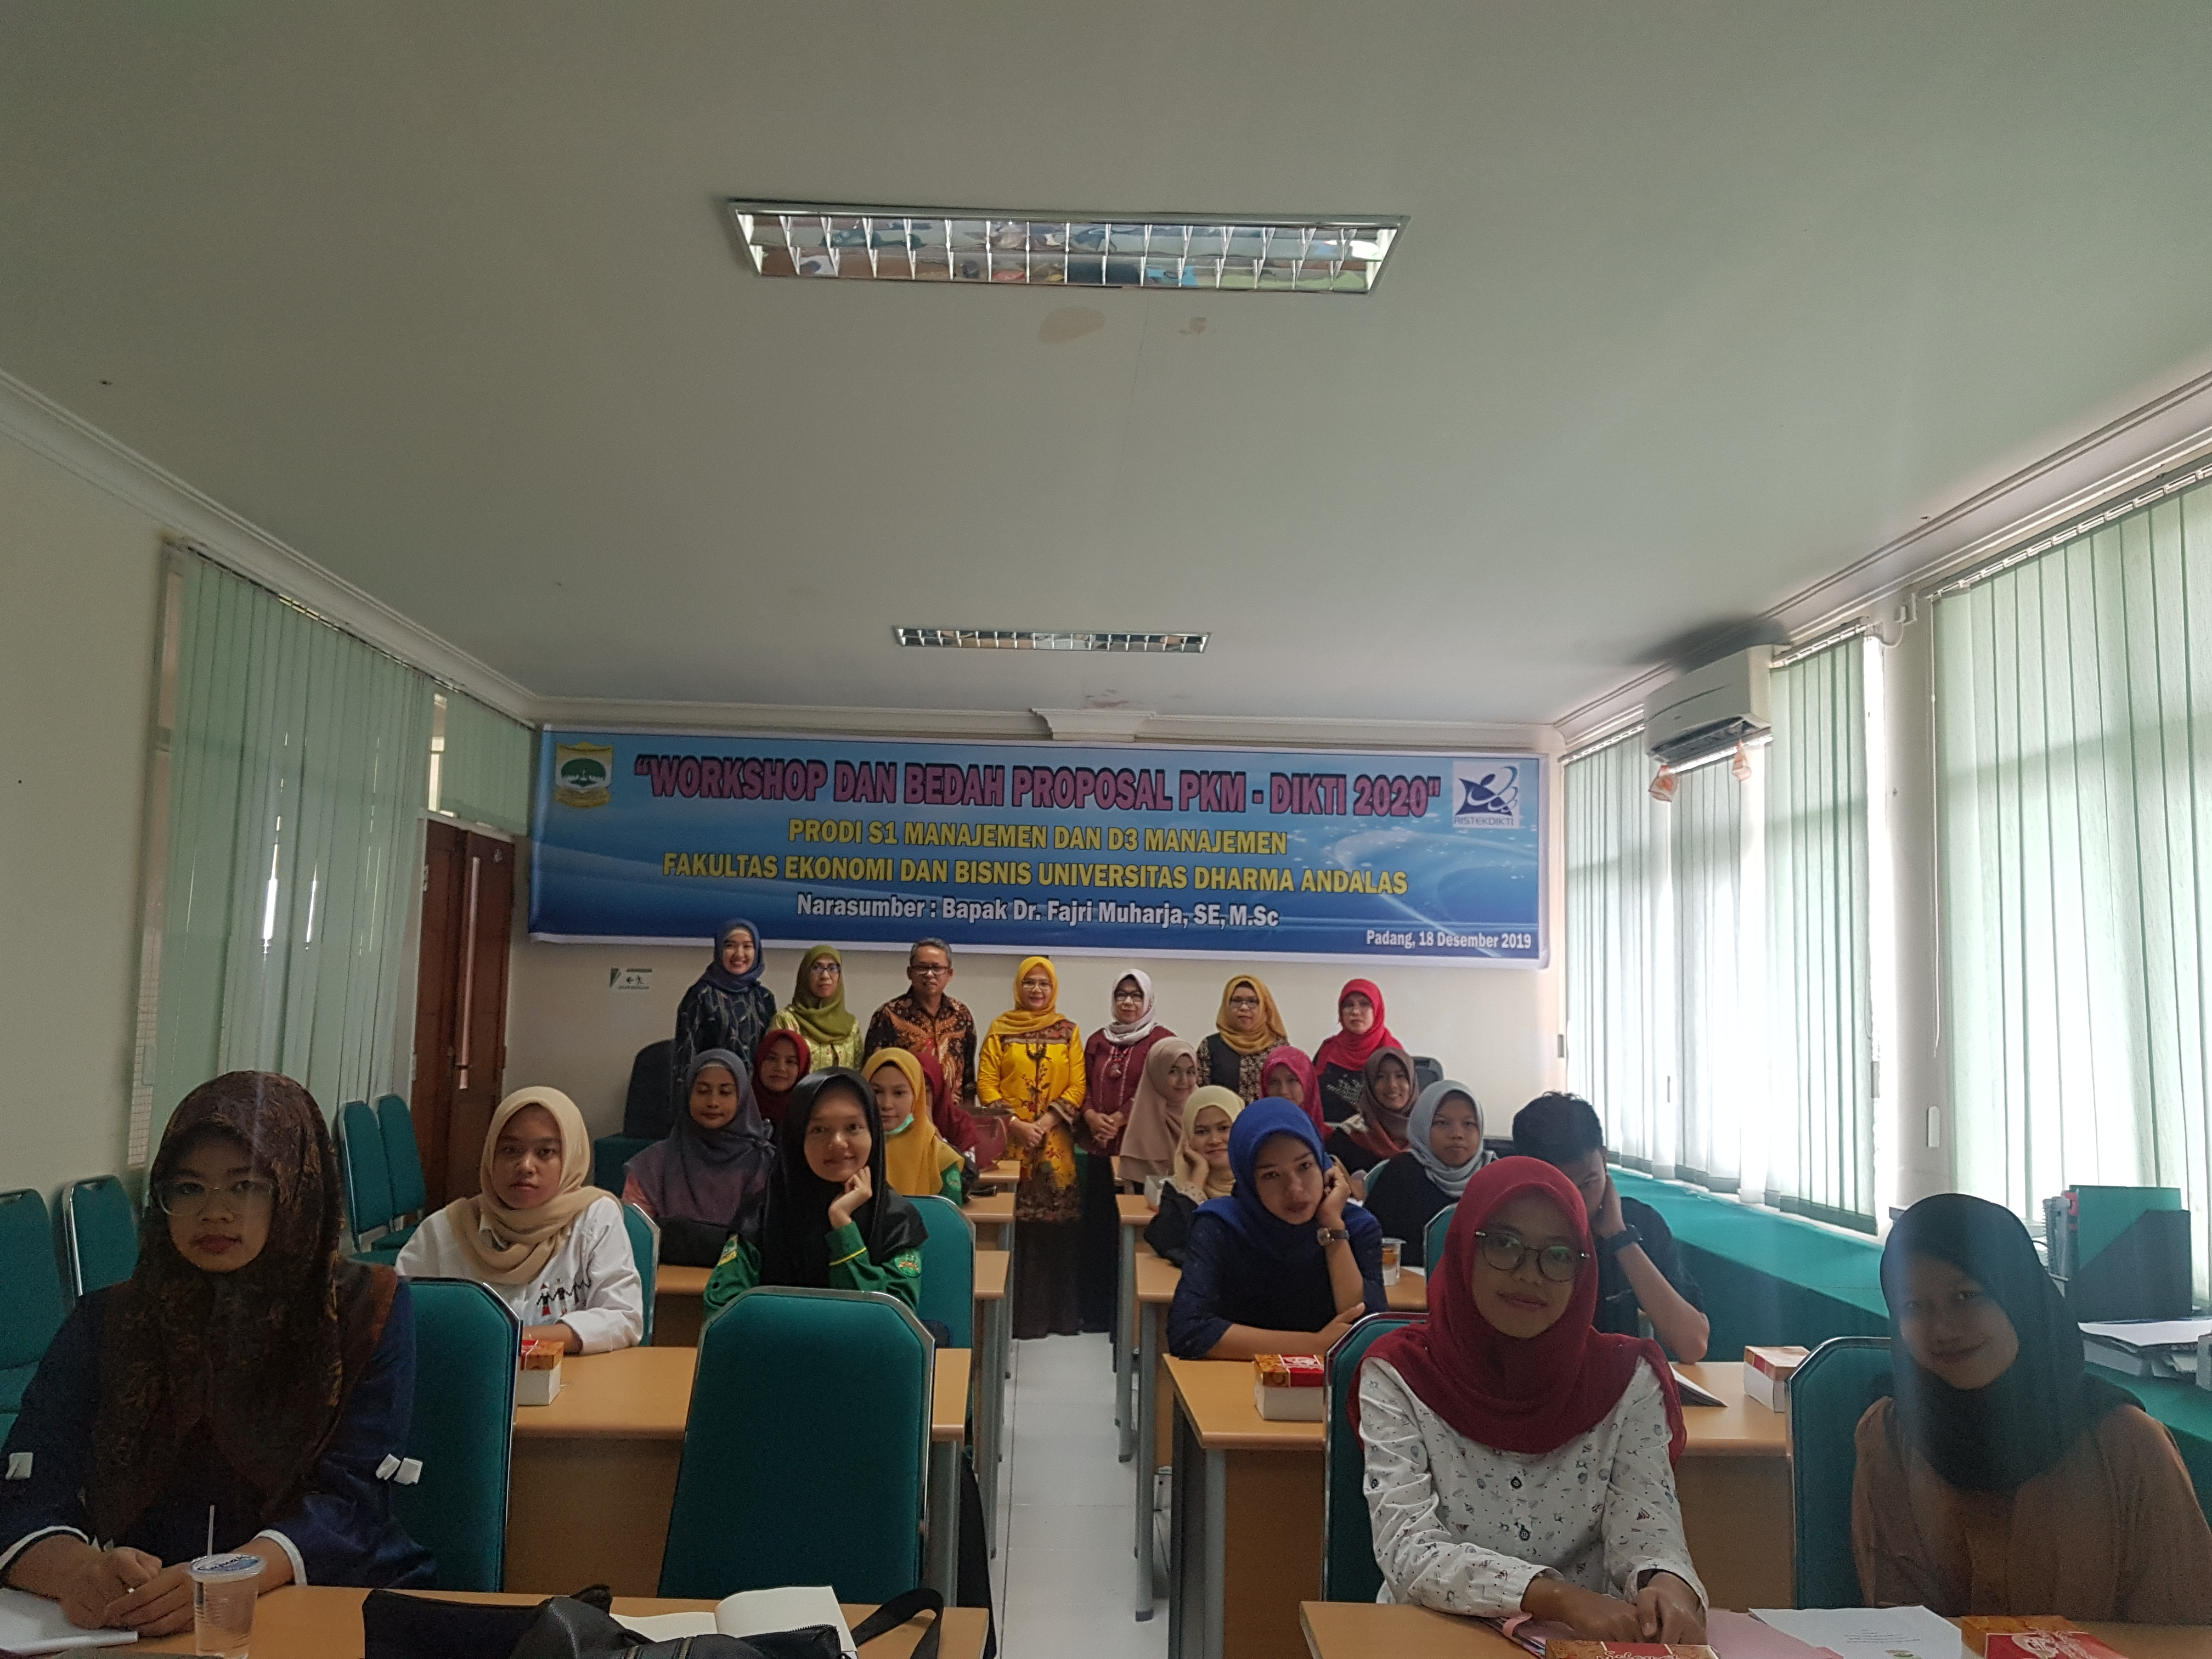 Workshop dan bedah proposal PKM-DIKTI 2020